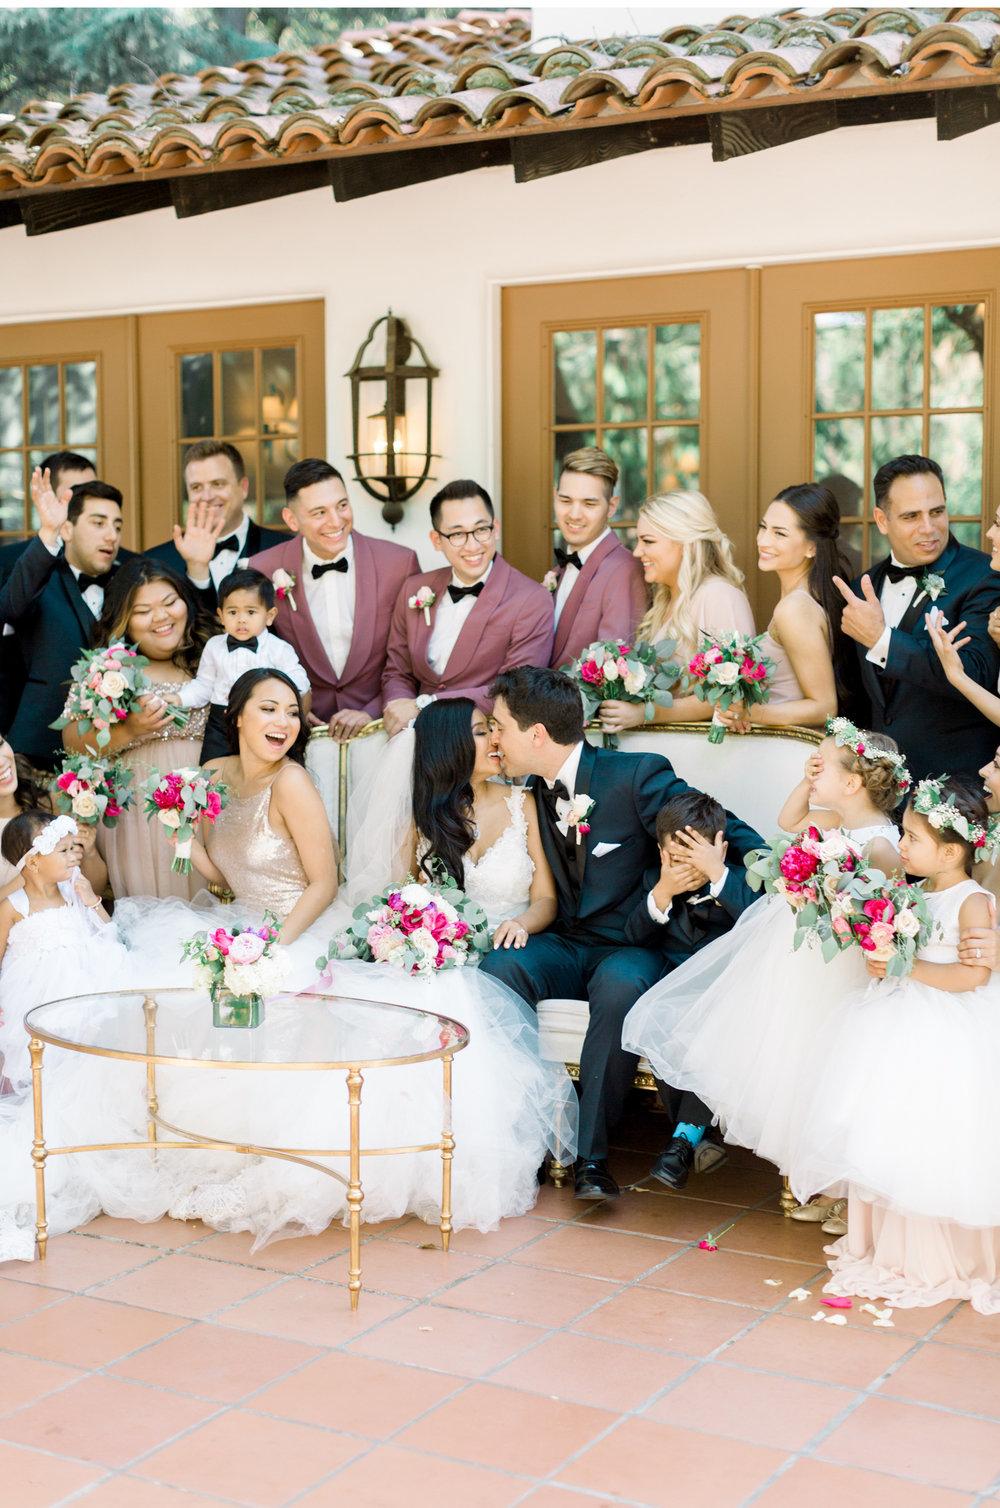 Rancho-Las-Lomas-Style-Me-Pretty-Wedding-Natalie-Schutt-Photography_01.jpg